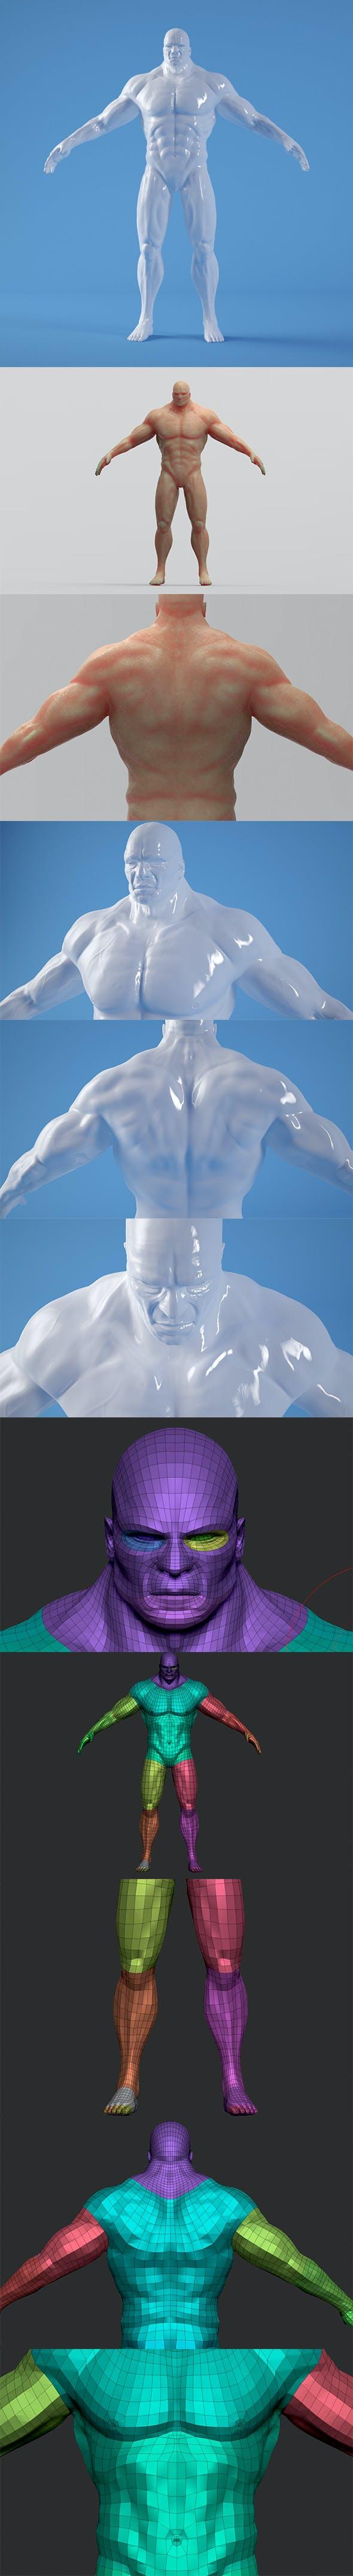 Muscled Man - Base Mesh Body Man - 3DOcean Item for Sale